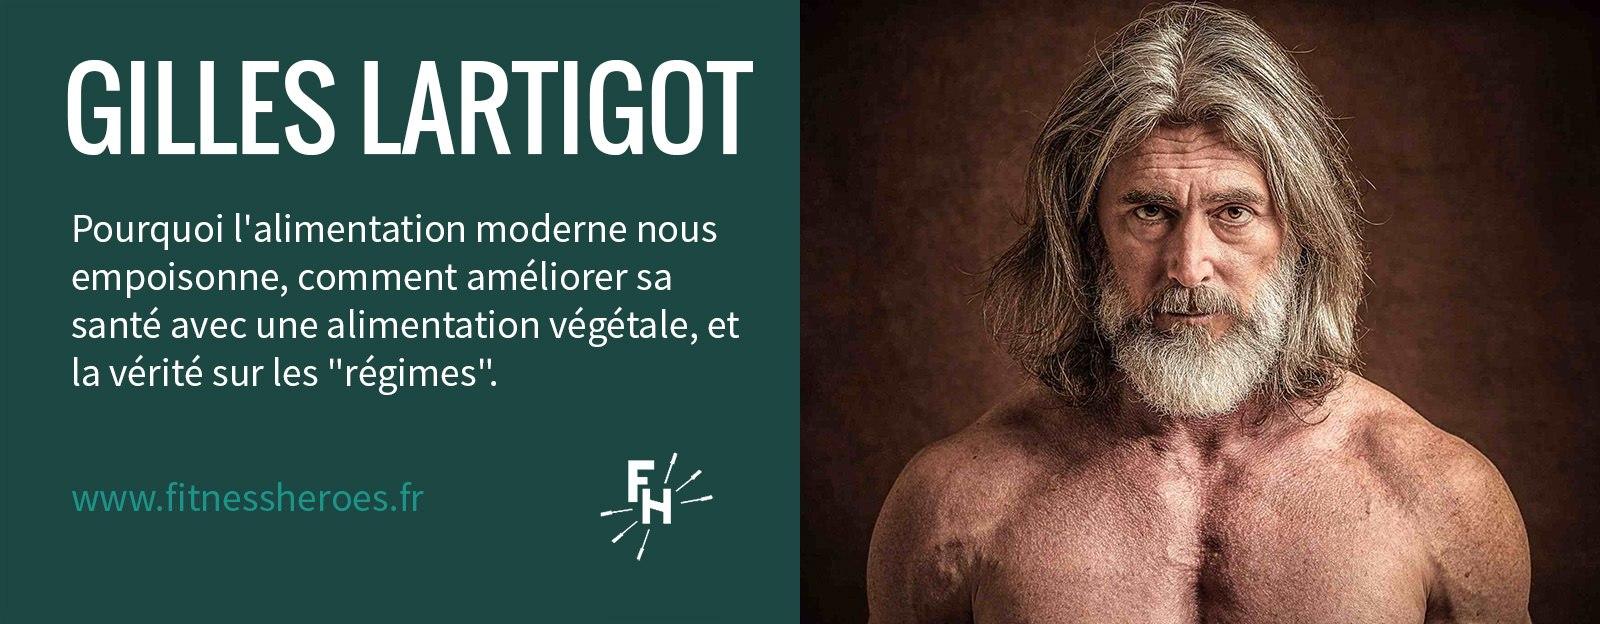 Épisode 01 du Podcast Fitness Heroes avec Gilles Lartigot